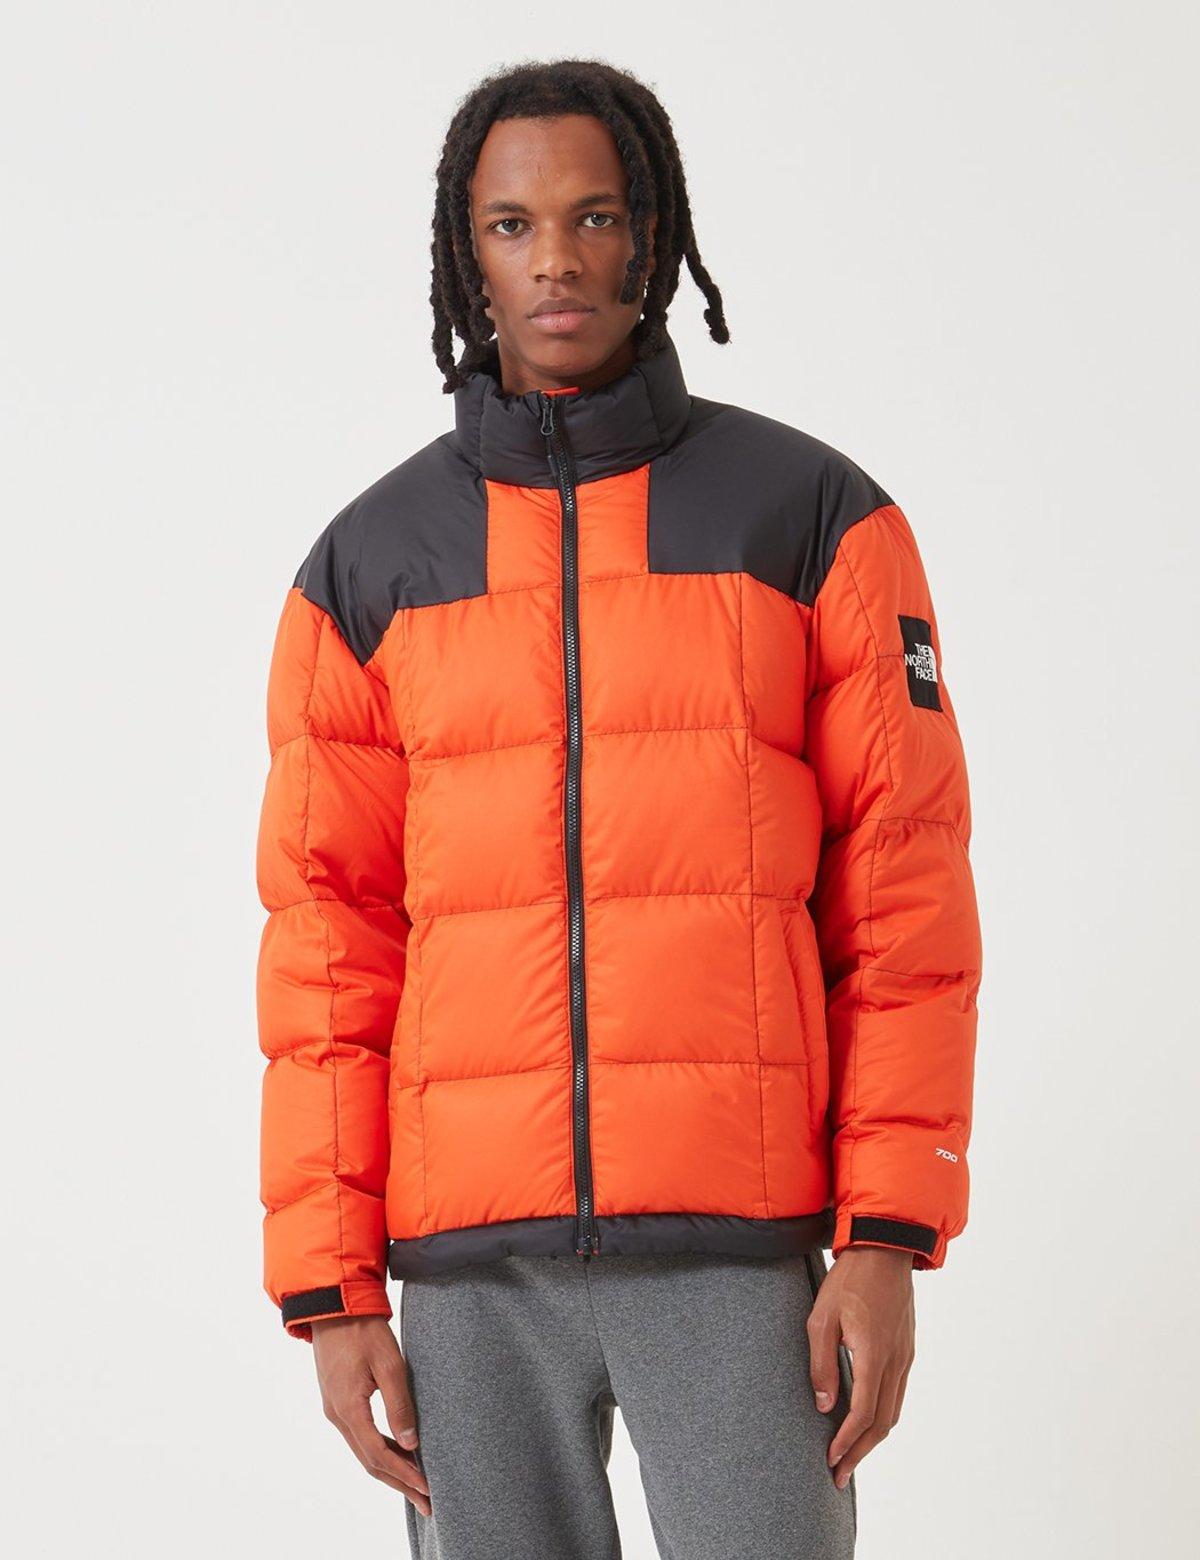 The North Face Black Label Lhotse Down Jacket Tangerine Tango